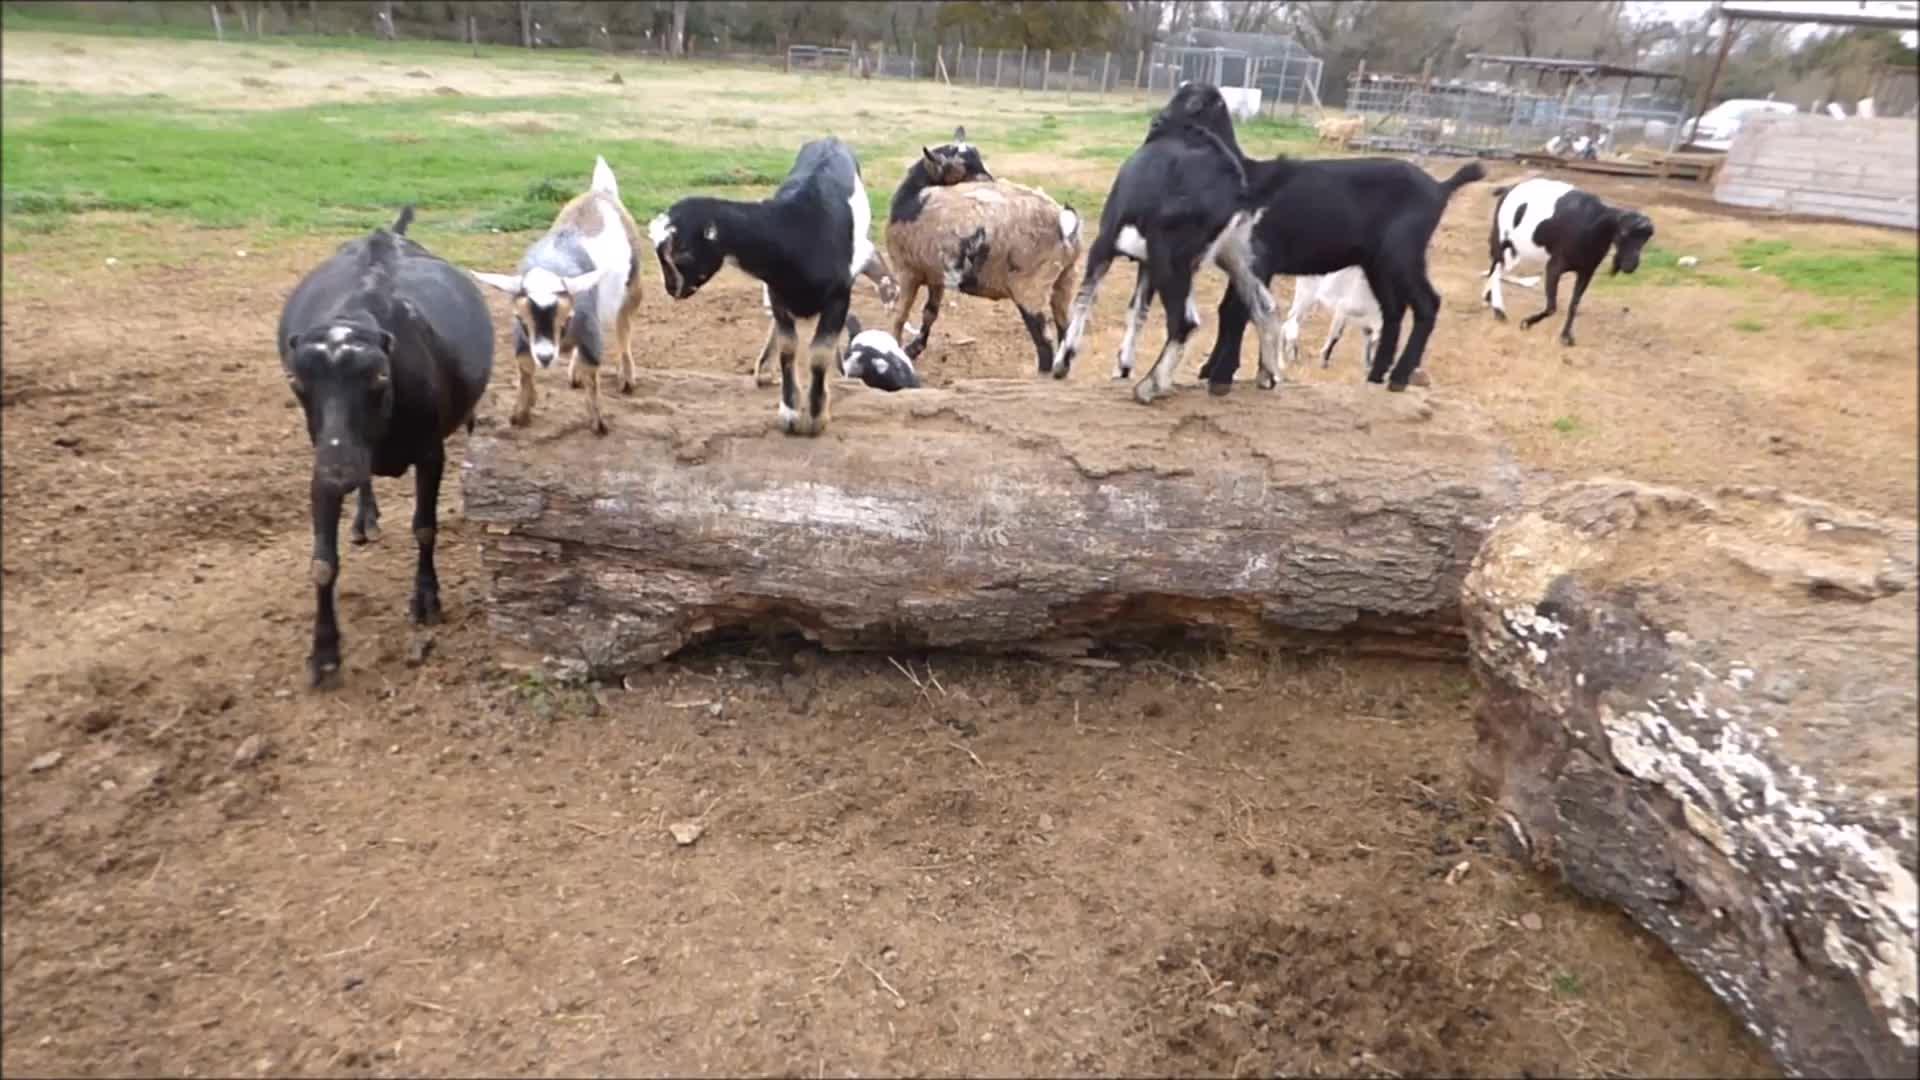 cute, goatparkour, goats, knsfarm, Avoiding Bigger Kids GIFs